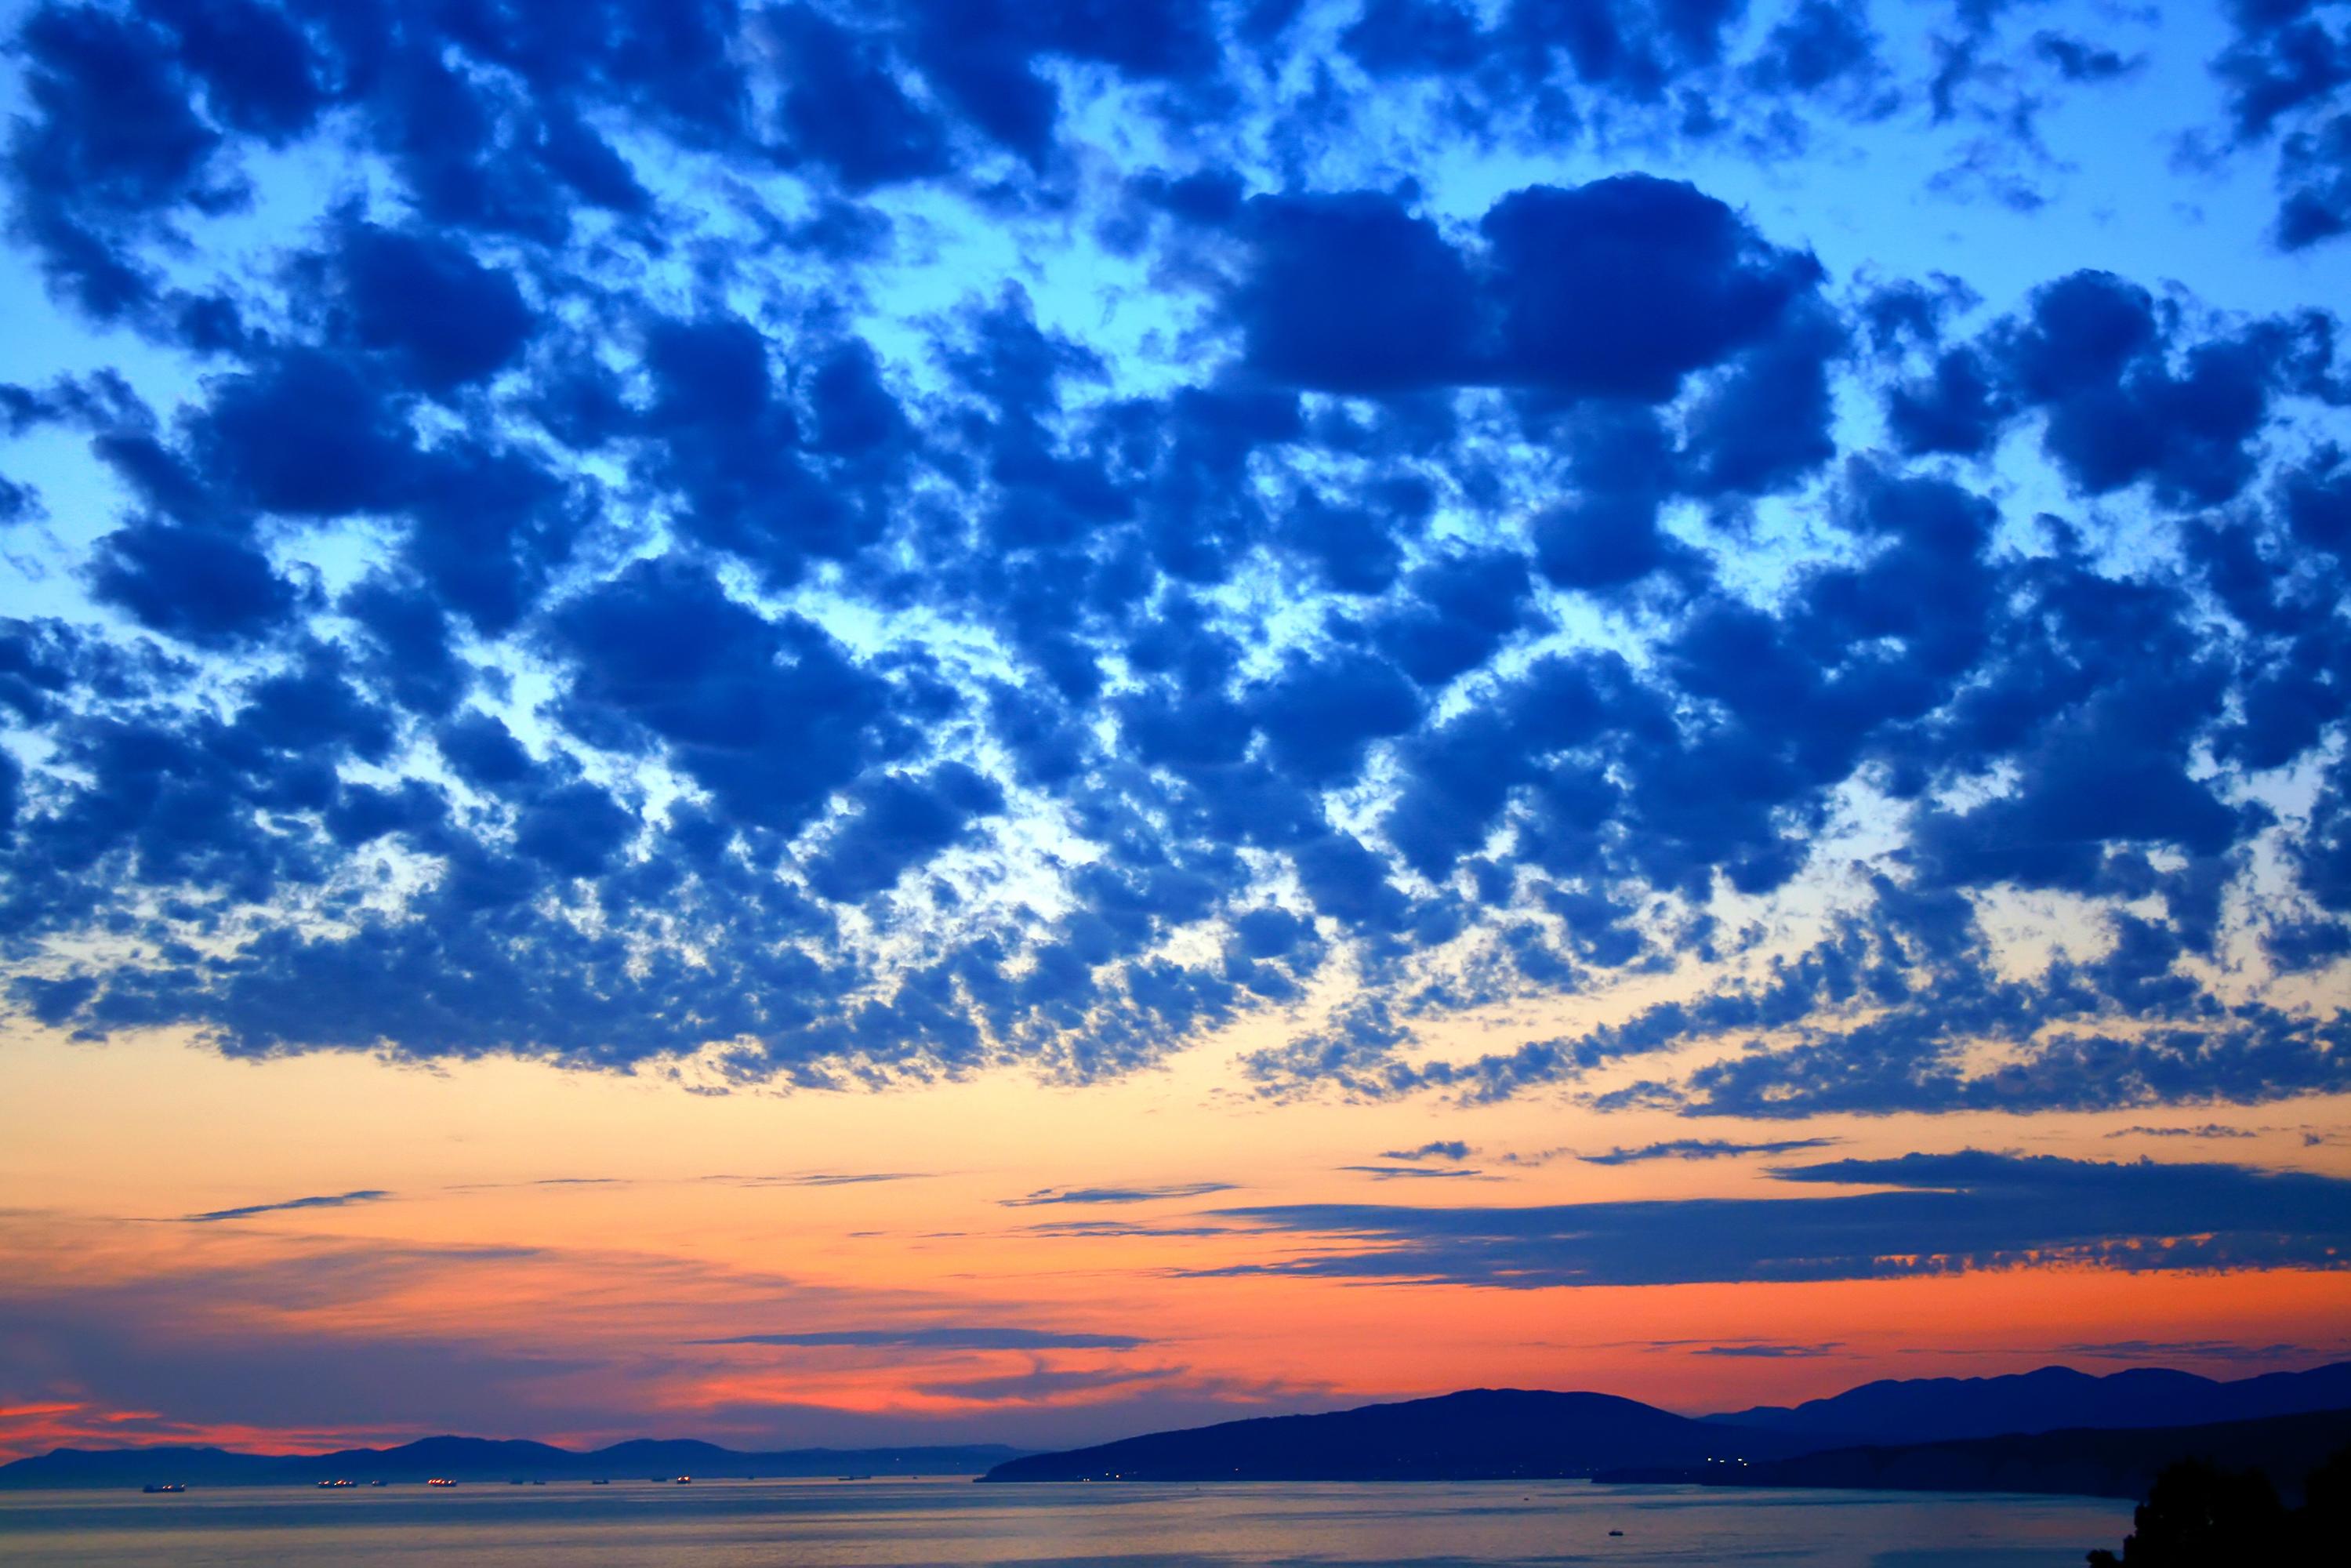 Sky over sea photo